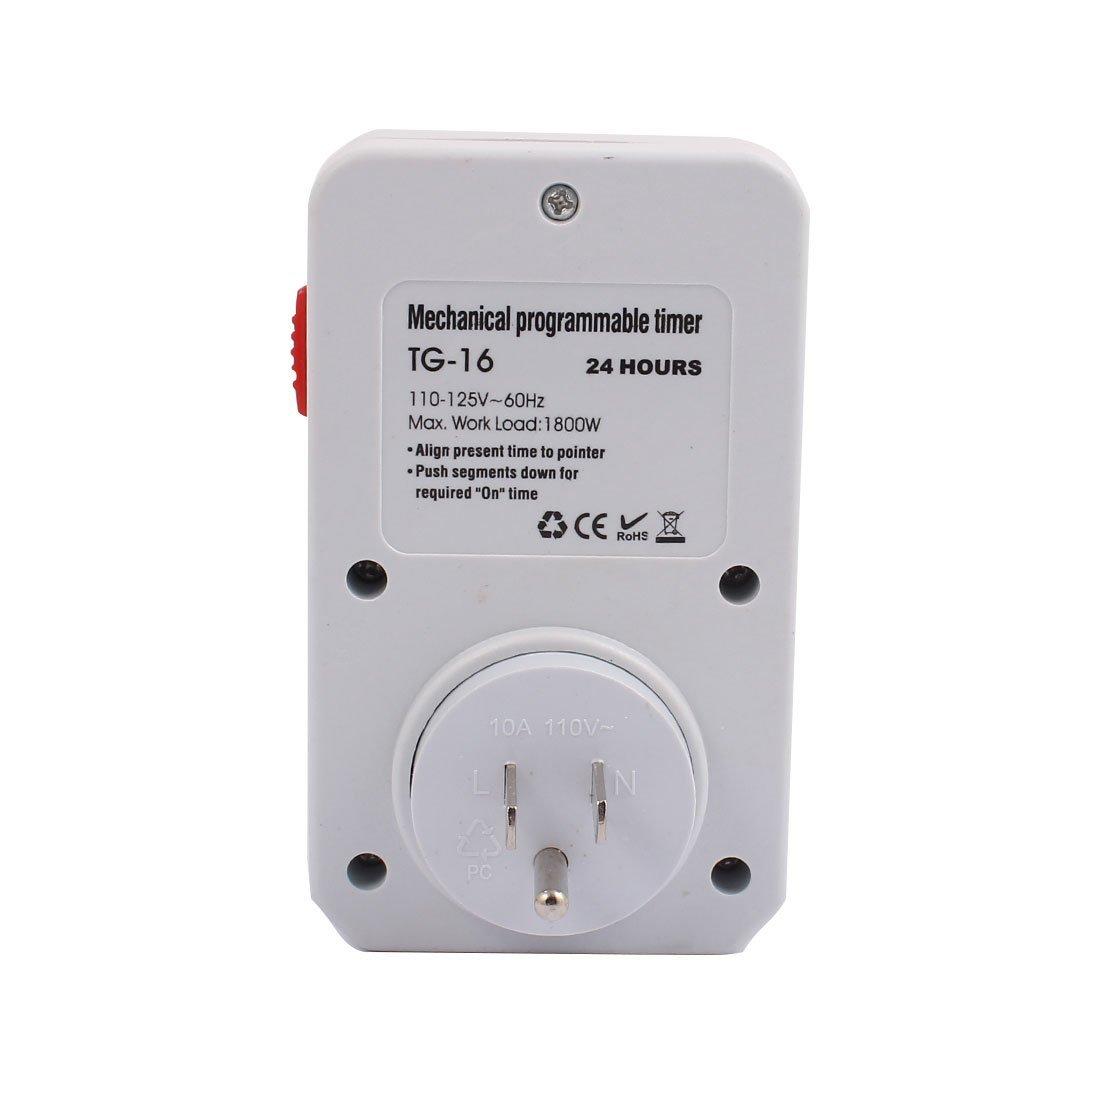 eDealMax 110-125V 1800W US Socket Mechanical Programmable Timer 3 Prong Outlet 24 Hours For Household Appliances